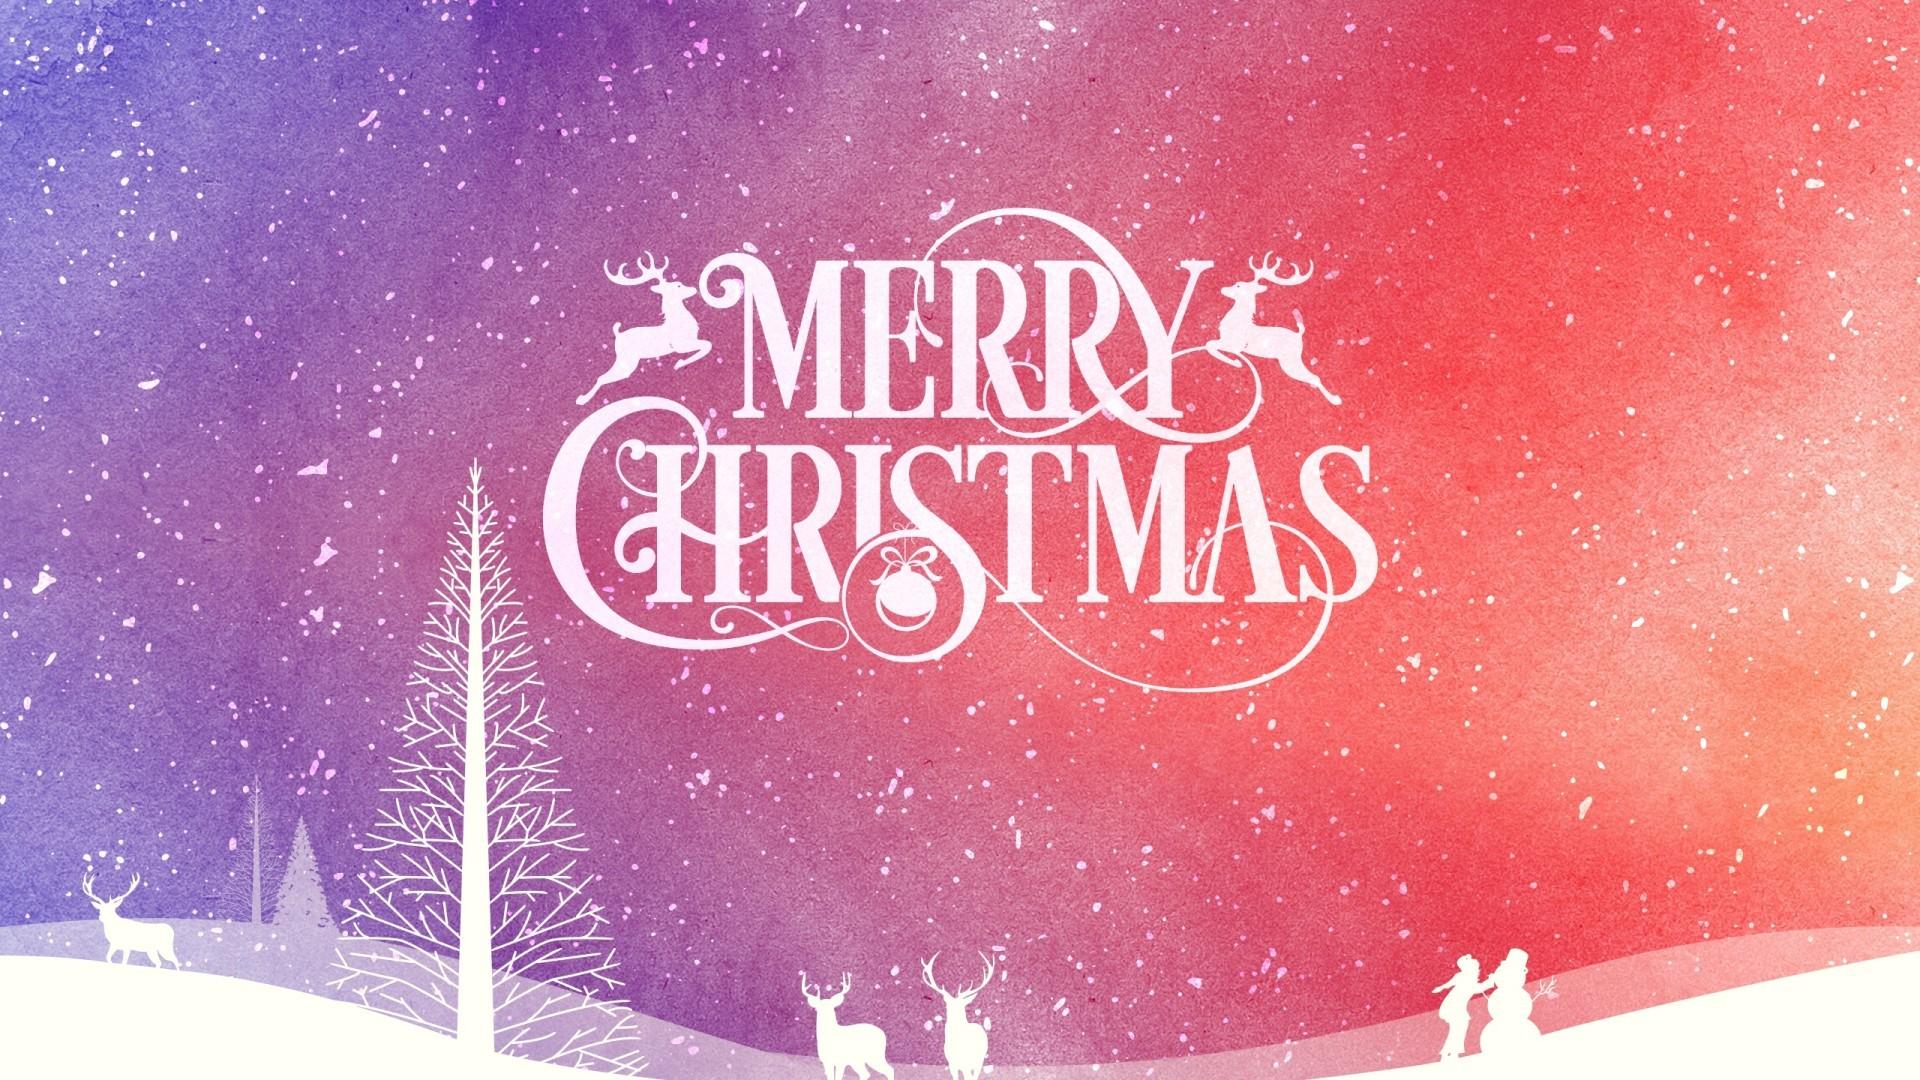 Christmas HD Wallpaper 2016